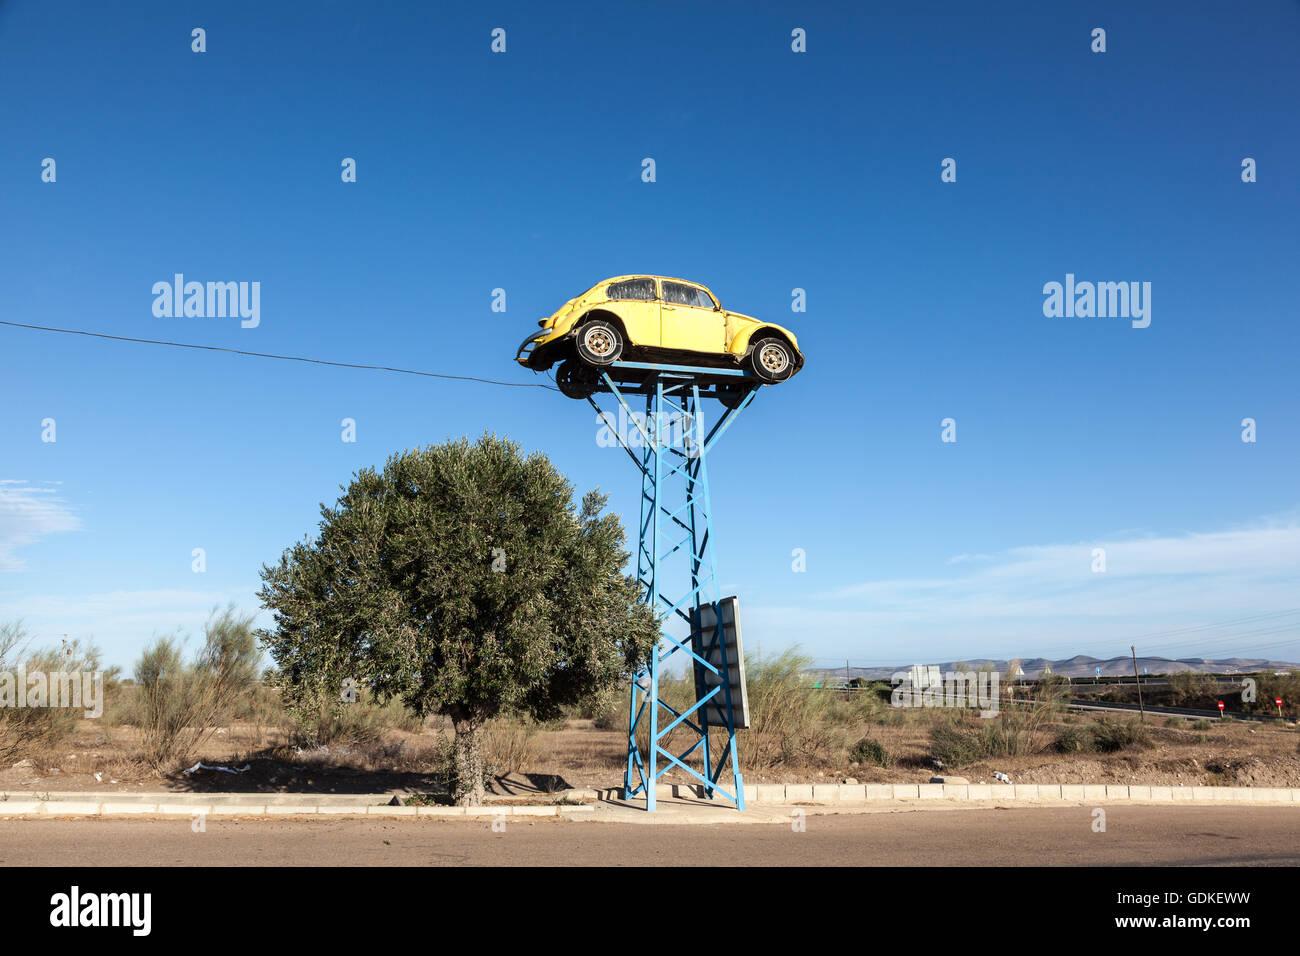 Old Volkswagen Beetle as Junkyard Sign - Stock Image